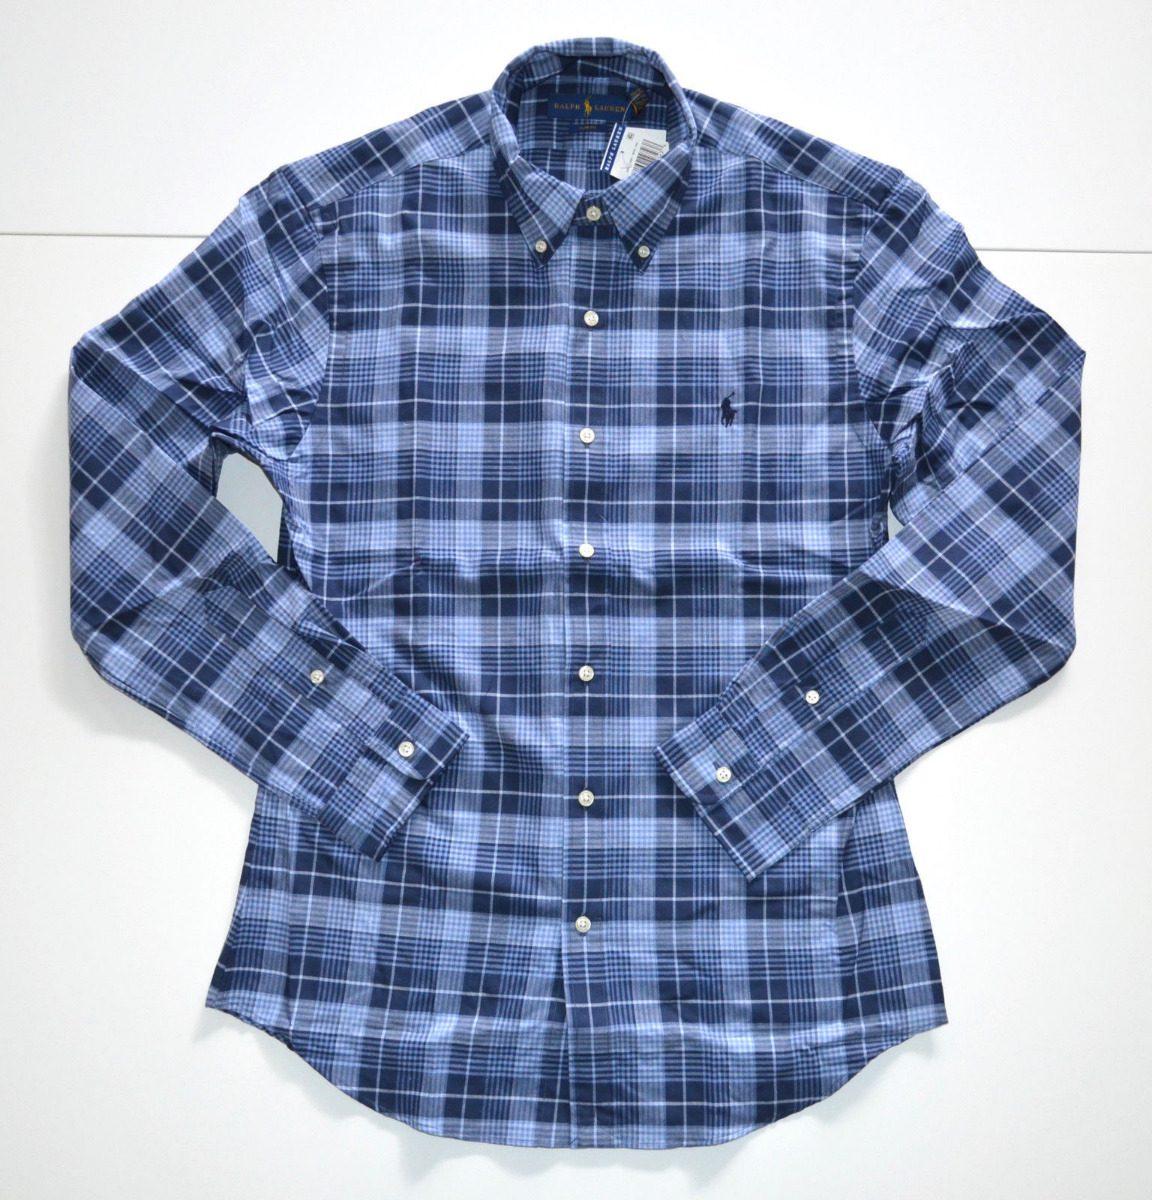 d28fc71f91b7f camisa social polo ralph lauren tamanho ggg   xxl slim fit. Carregando zoom.